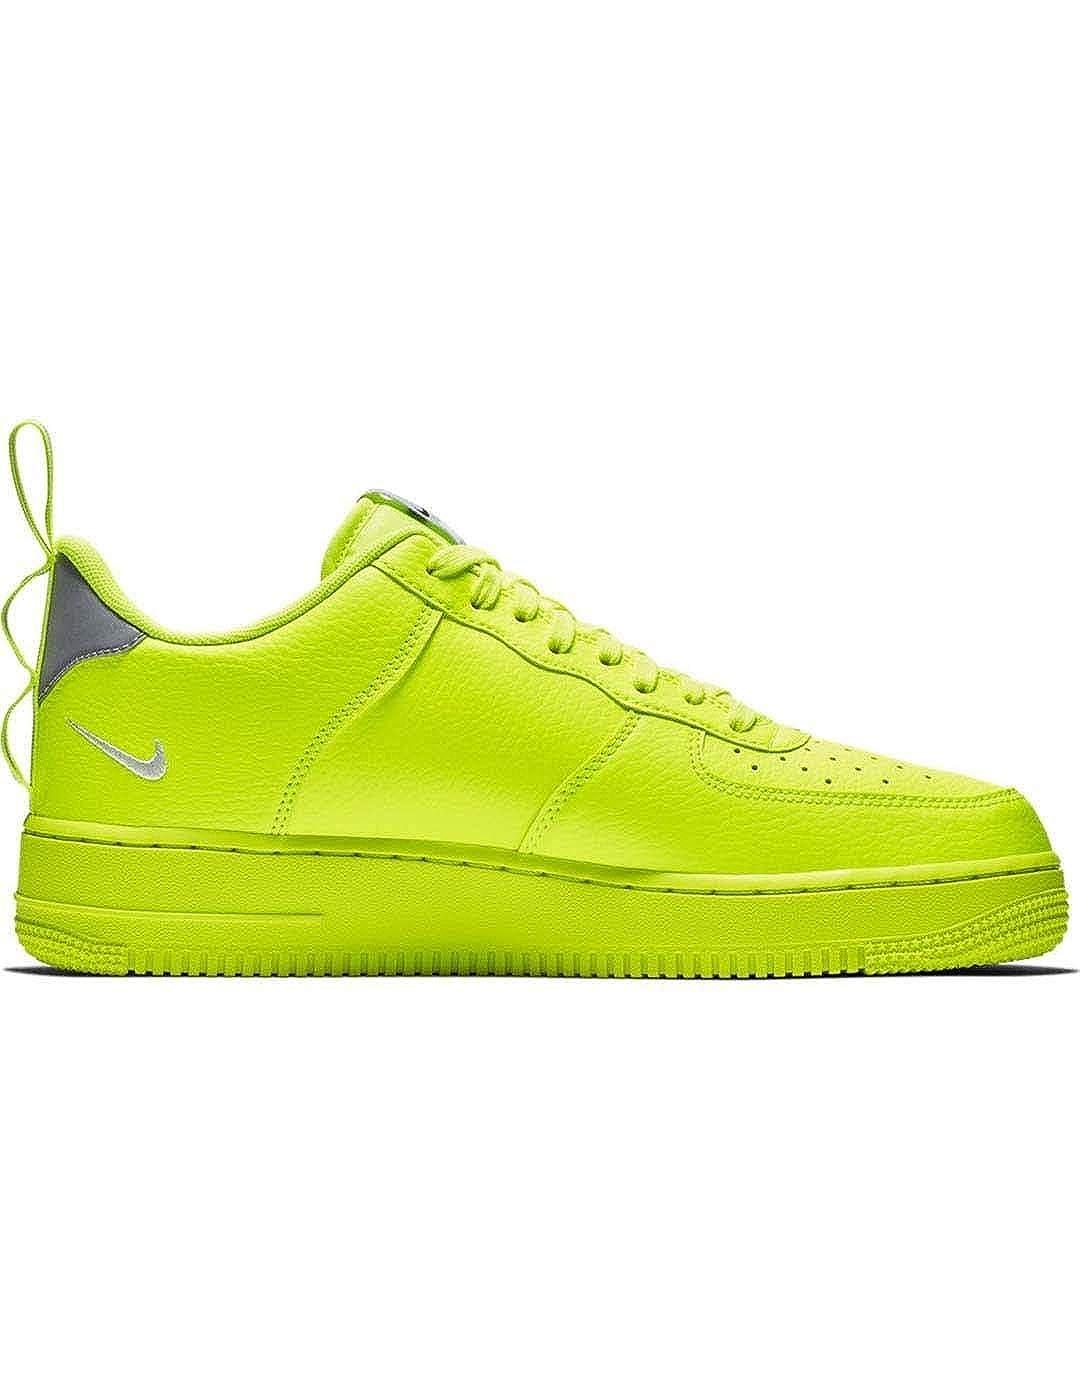 nike air force 1 lv8 giallo